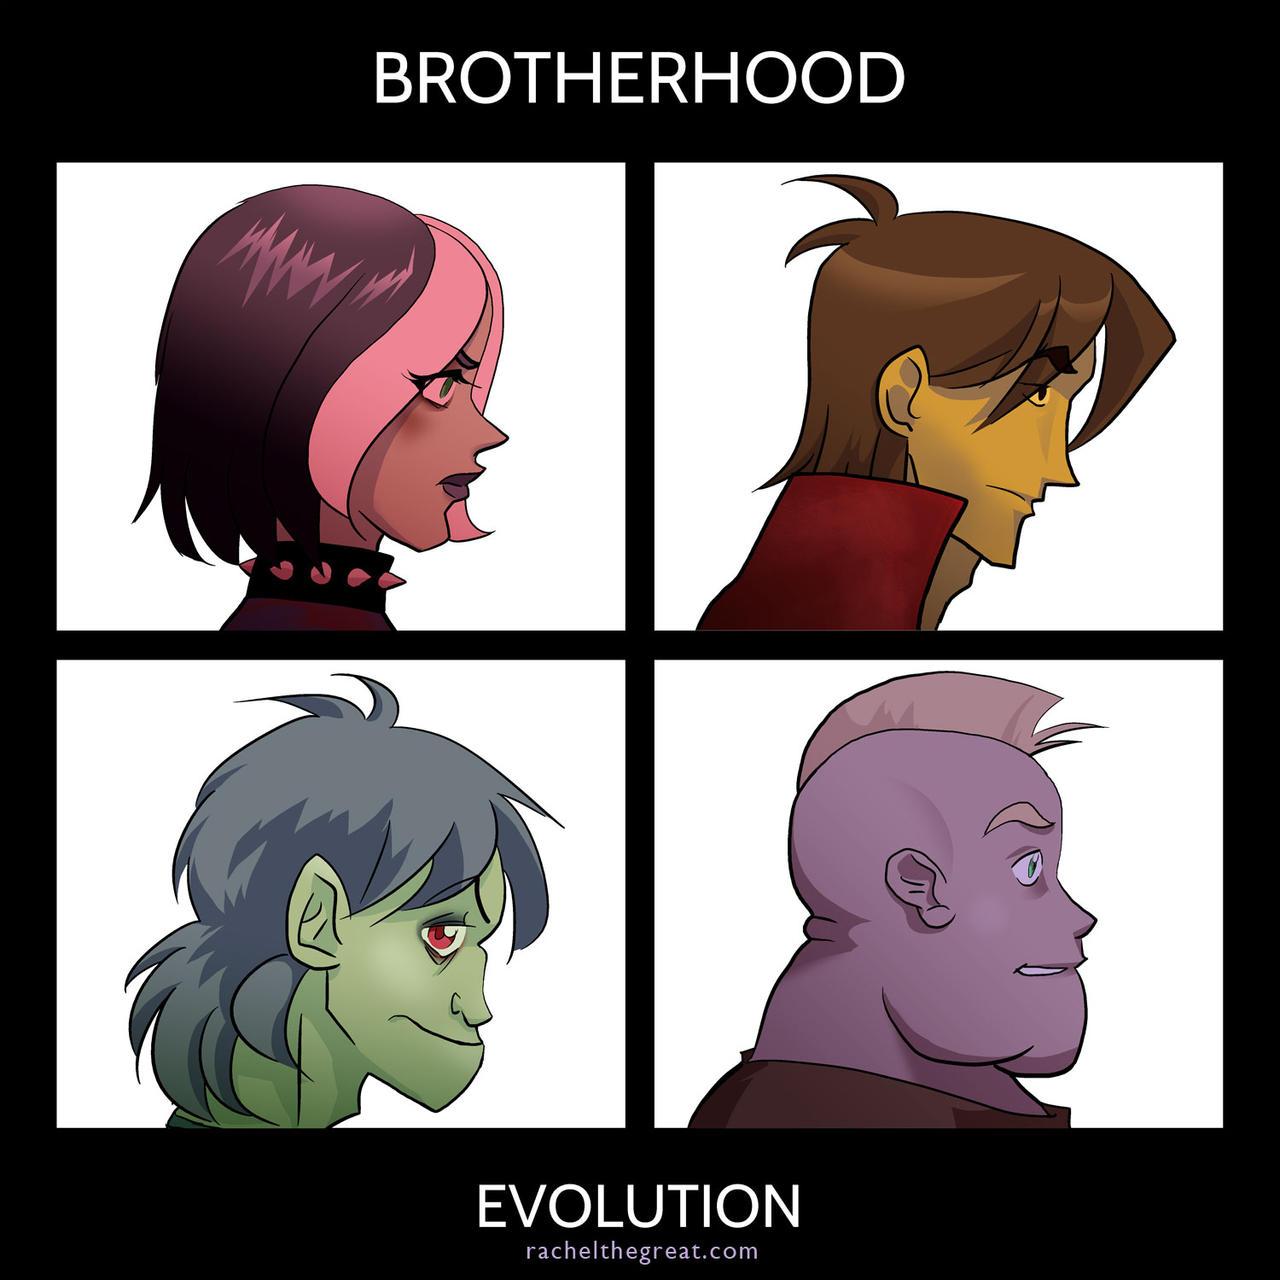 Evolution Album Art by rachelthegreat